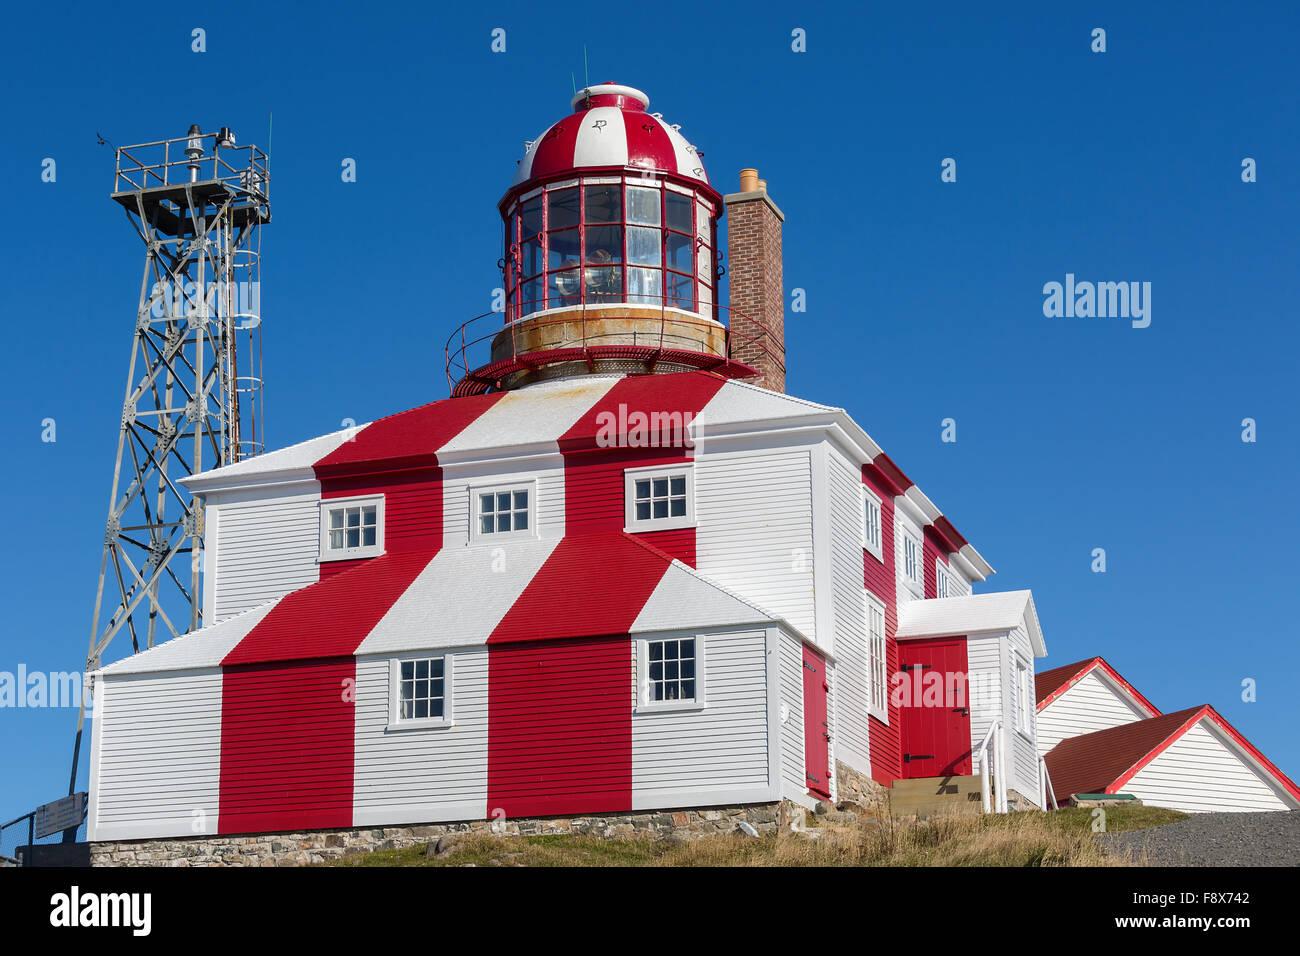 The historic Cape Bonavista Lighthouse in Newfoundland, Canada - Stock Image